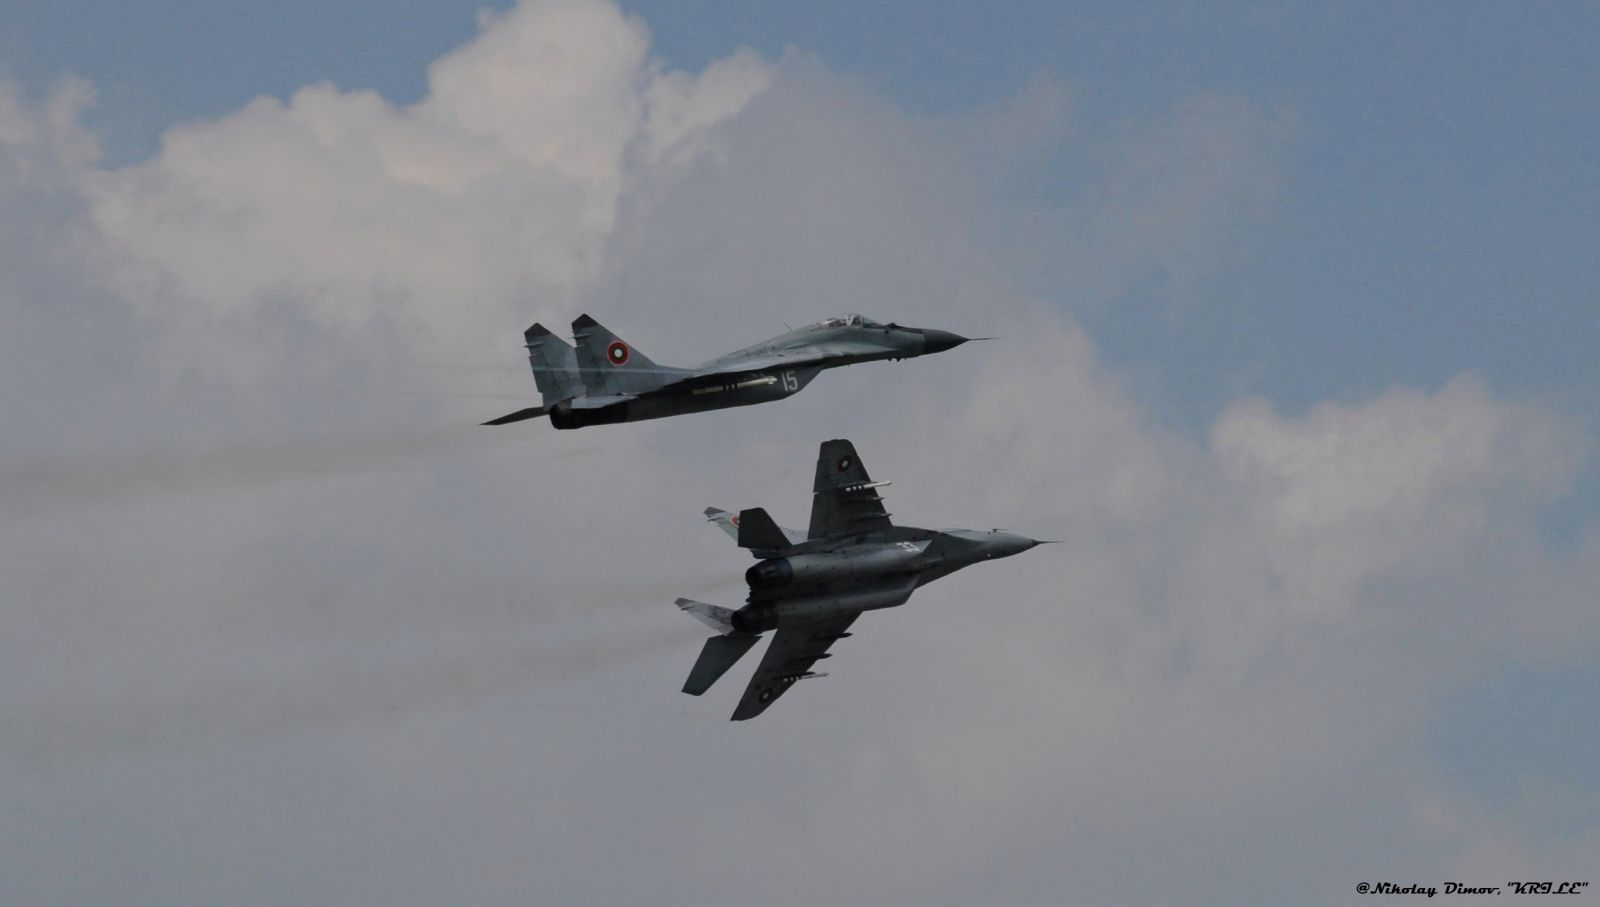 ГОРЕЩО: ДВА БЪЛГАРСКИ МИГ-29 ПРОГОНИХА РУСКИ БОМБАРДИРОВАЧИ ТУ-22М3 НАД ЧЕРНО МОРЕ!!! (ВИДЕО И ГАЛЕРИЯ)